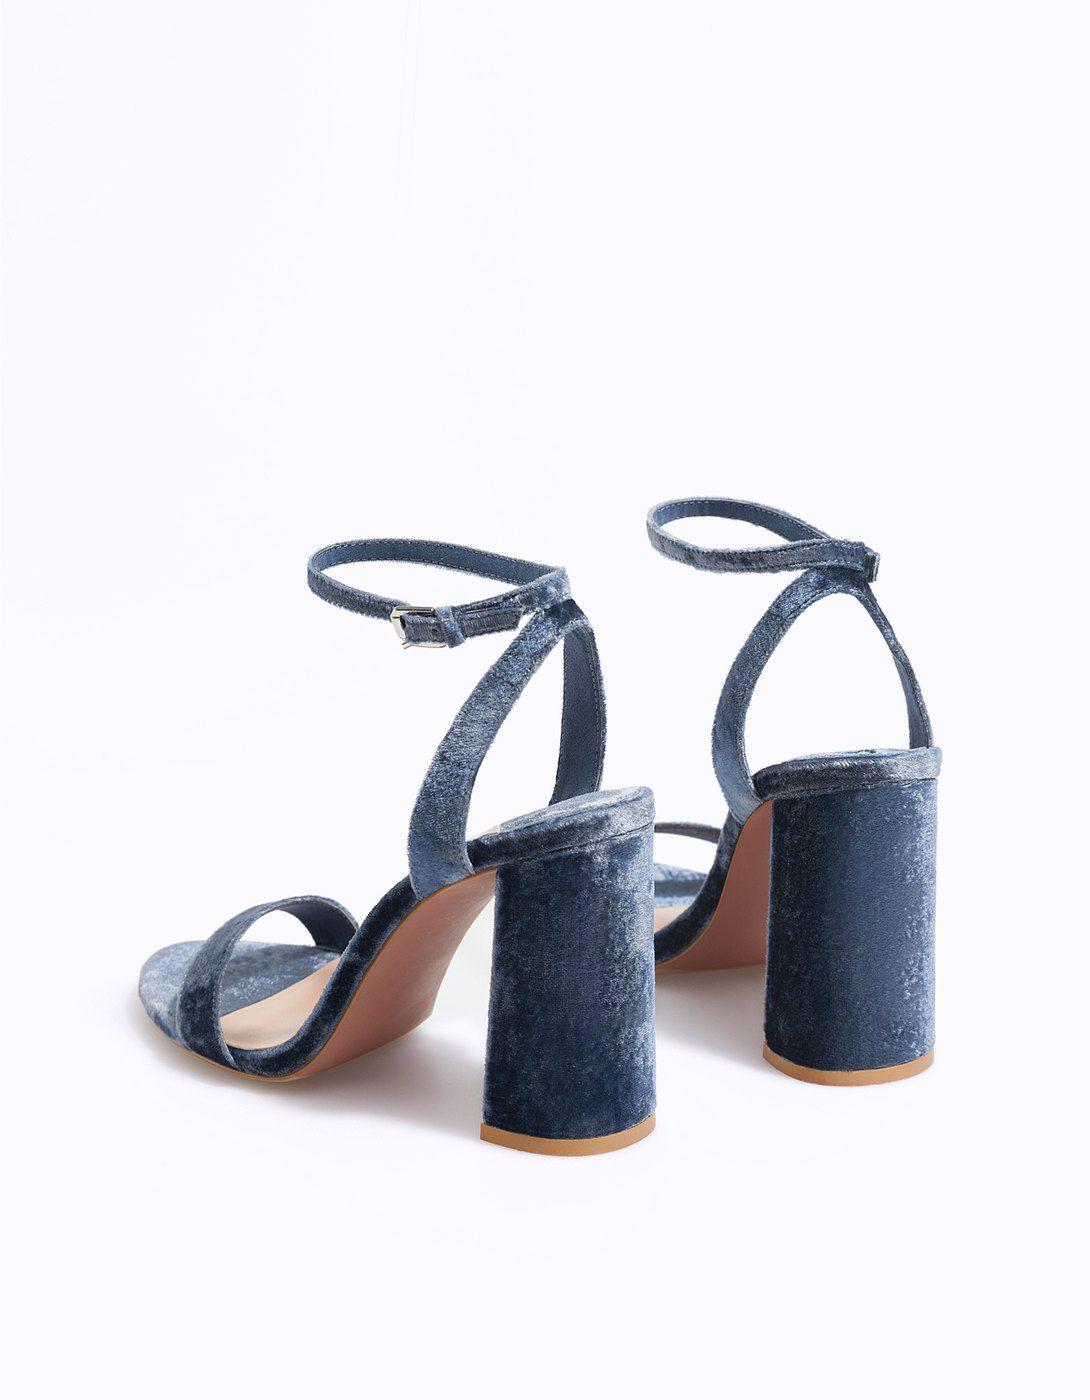 0fd68be7b1 Sandalo tacco velluto - Scarpe| Stradivarius Italia | S H Ö E S ...